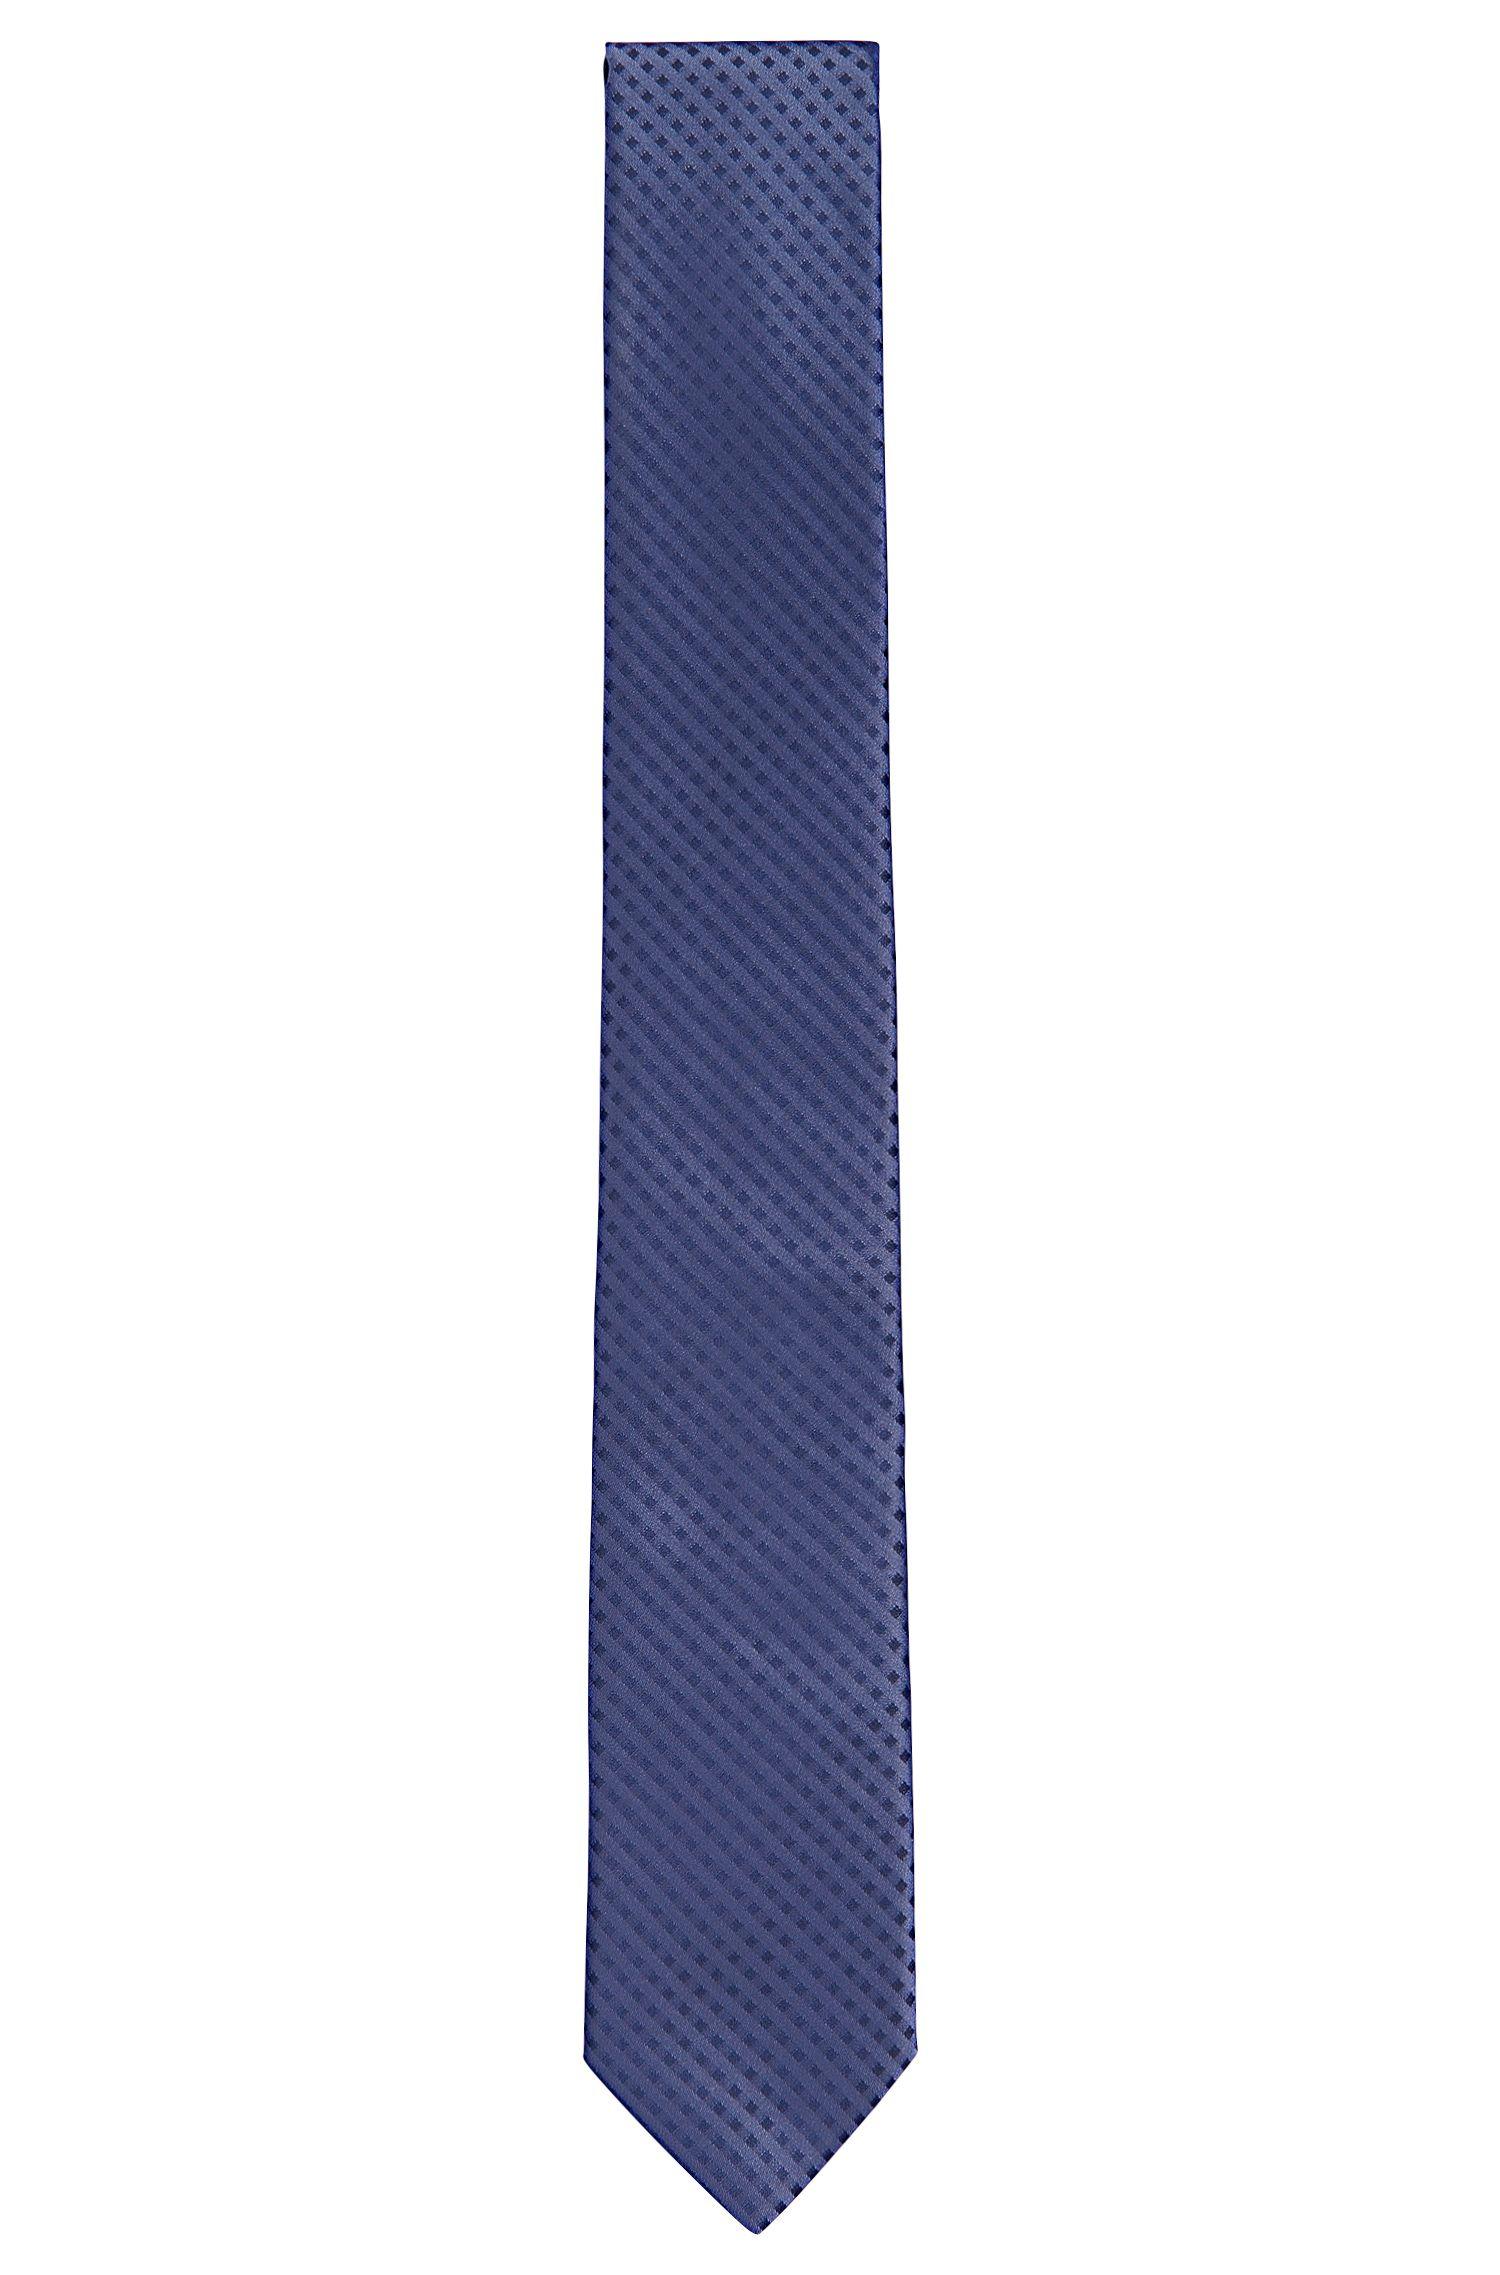 Diamond Embroidered Silk Tie, Slim | Tie 6 cm